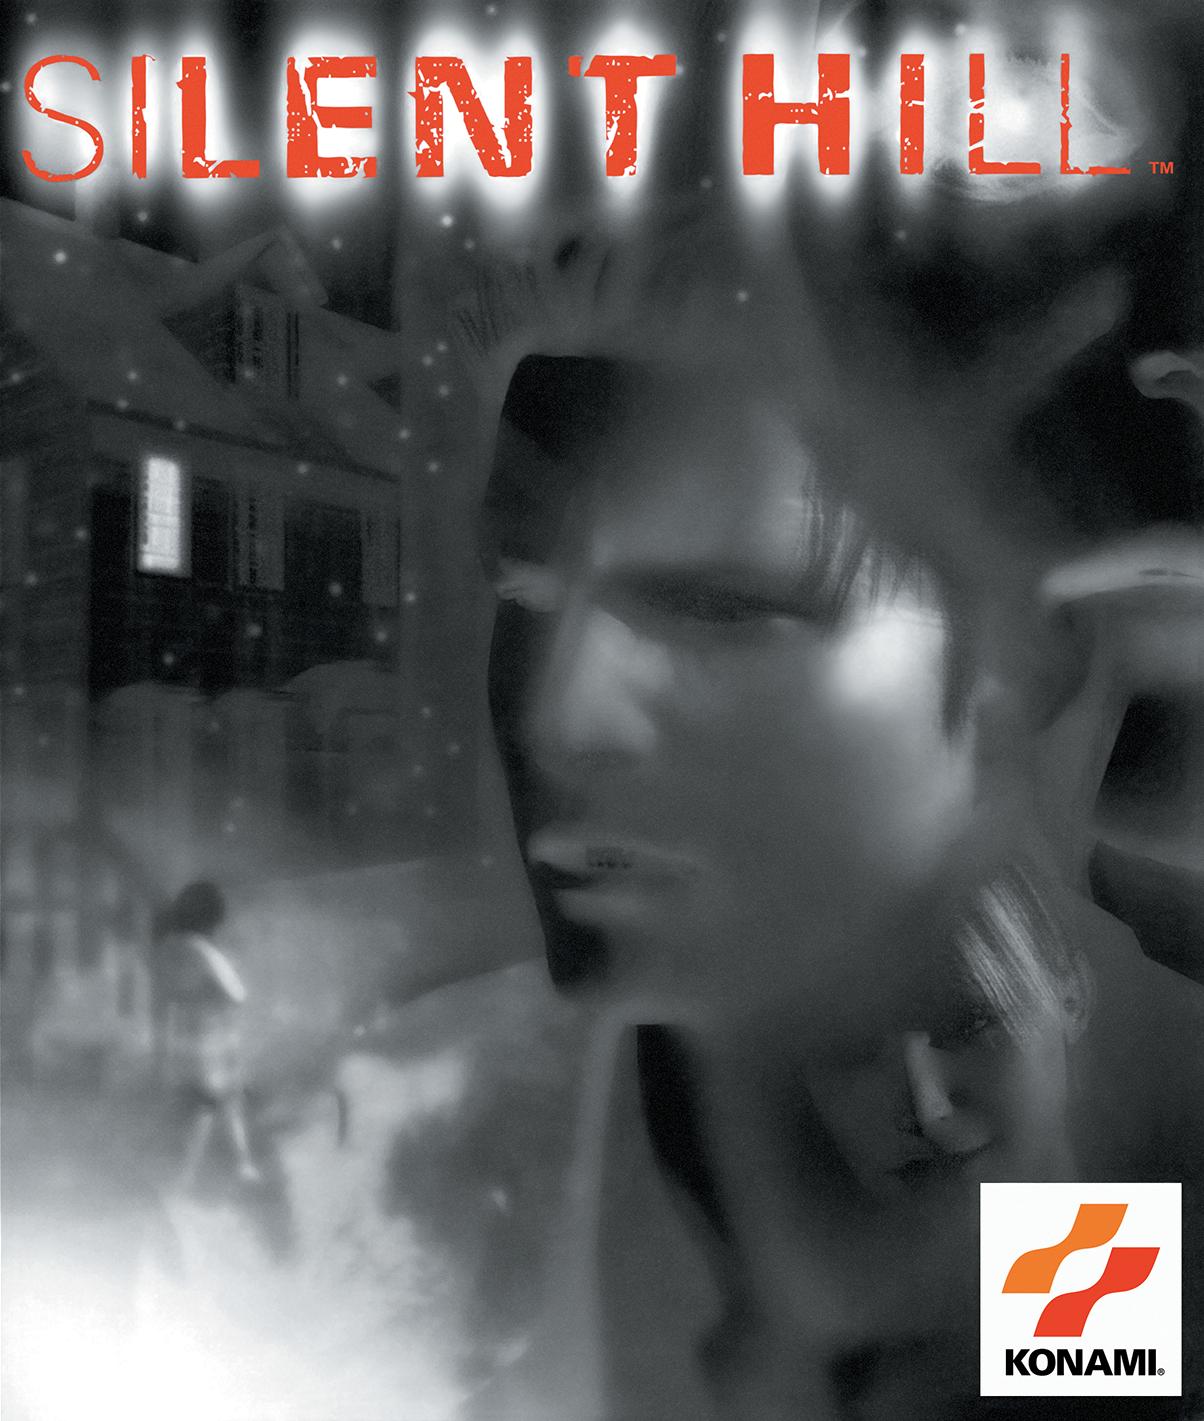 Silent Hill Silent Hill Silent Hill 1 Silent